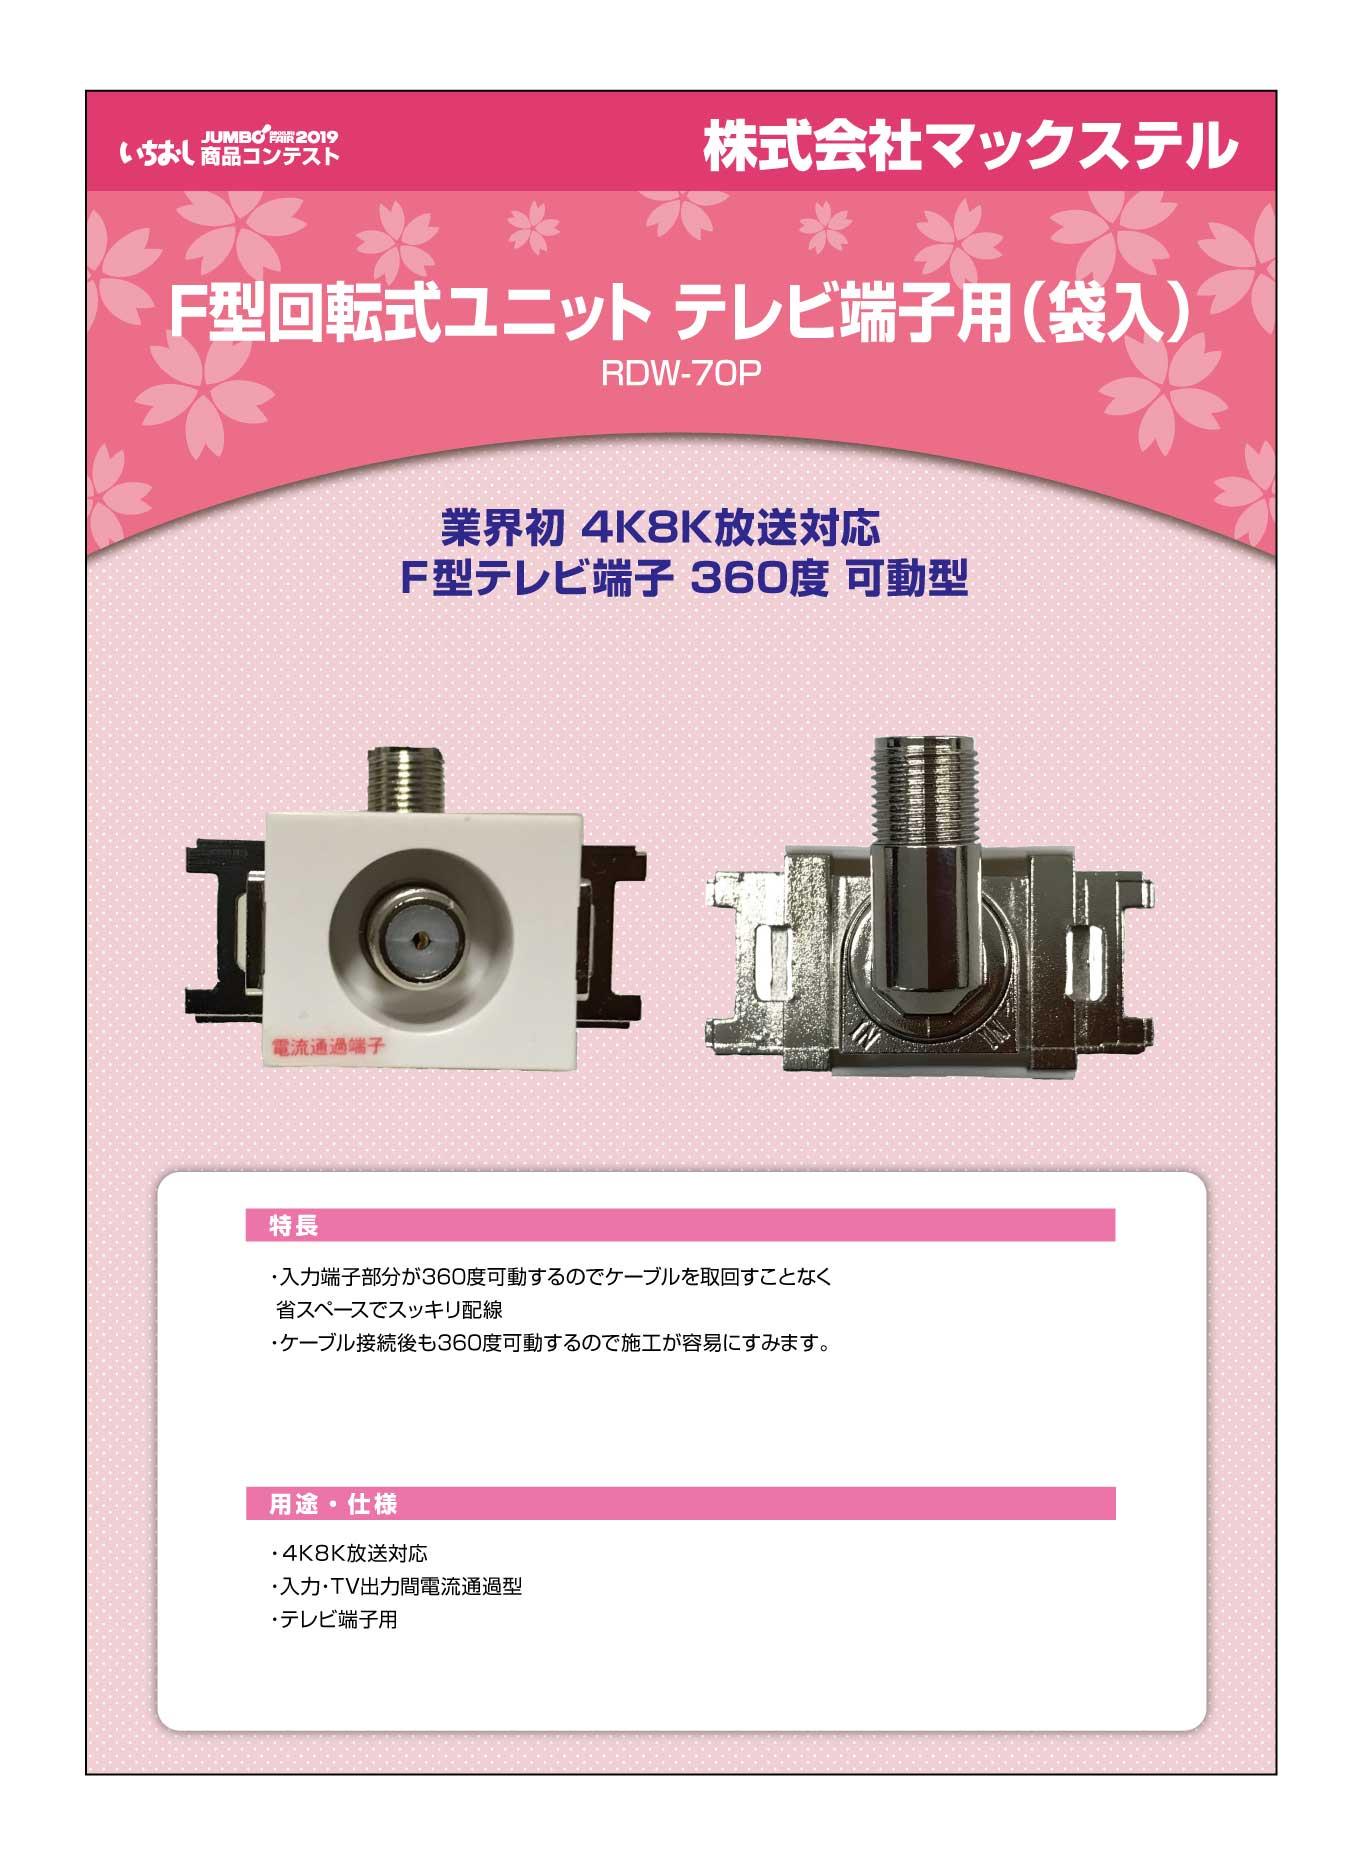 「F型回転式ユニット テレビ端子用」株式会社マックステルの画像